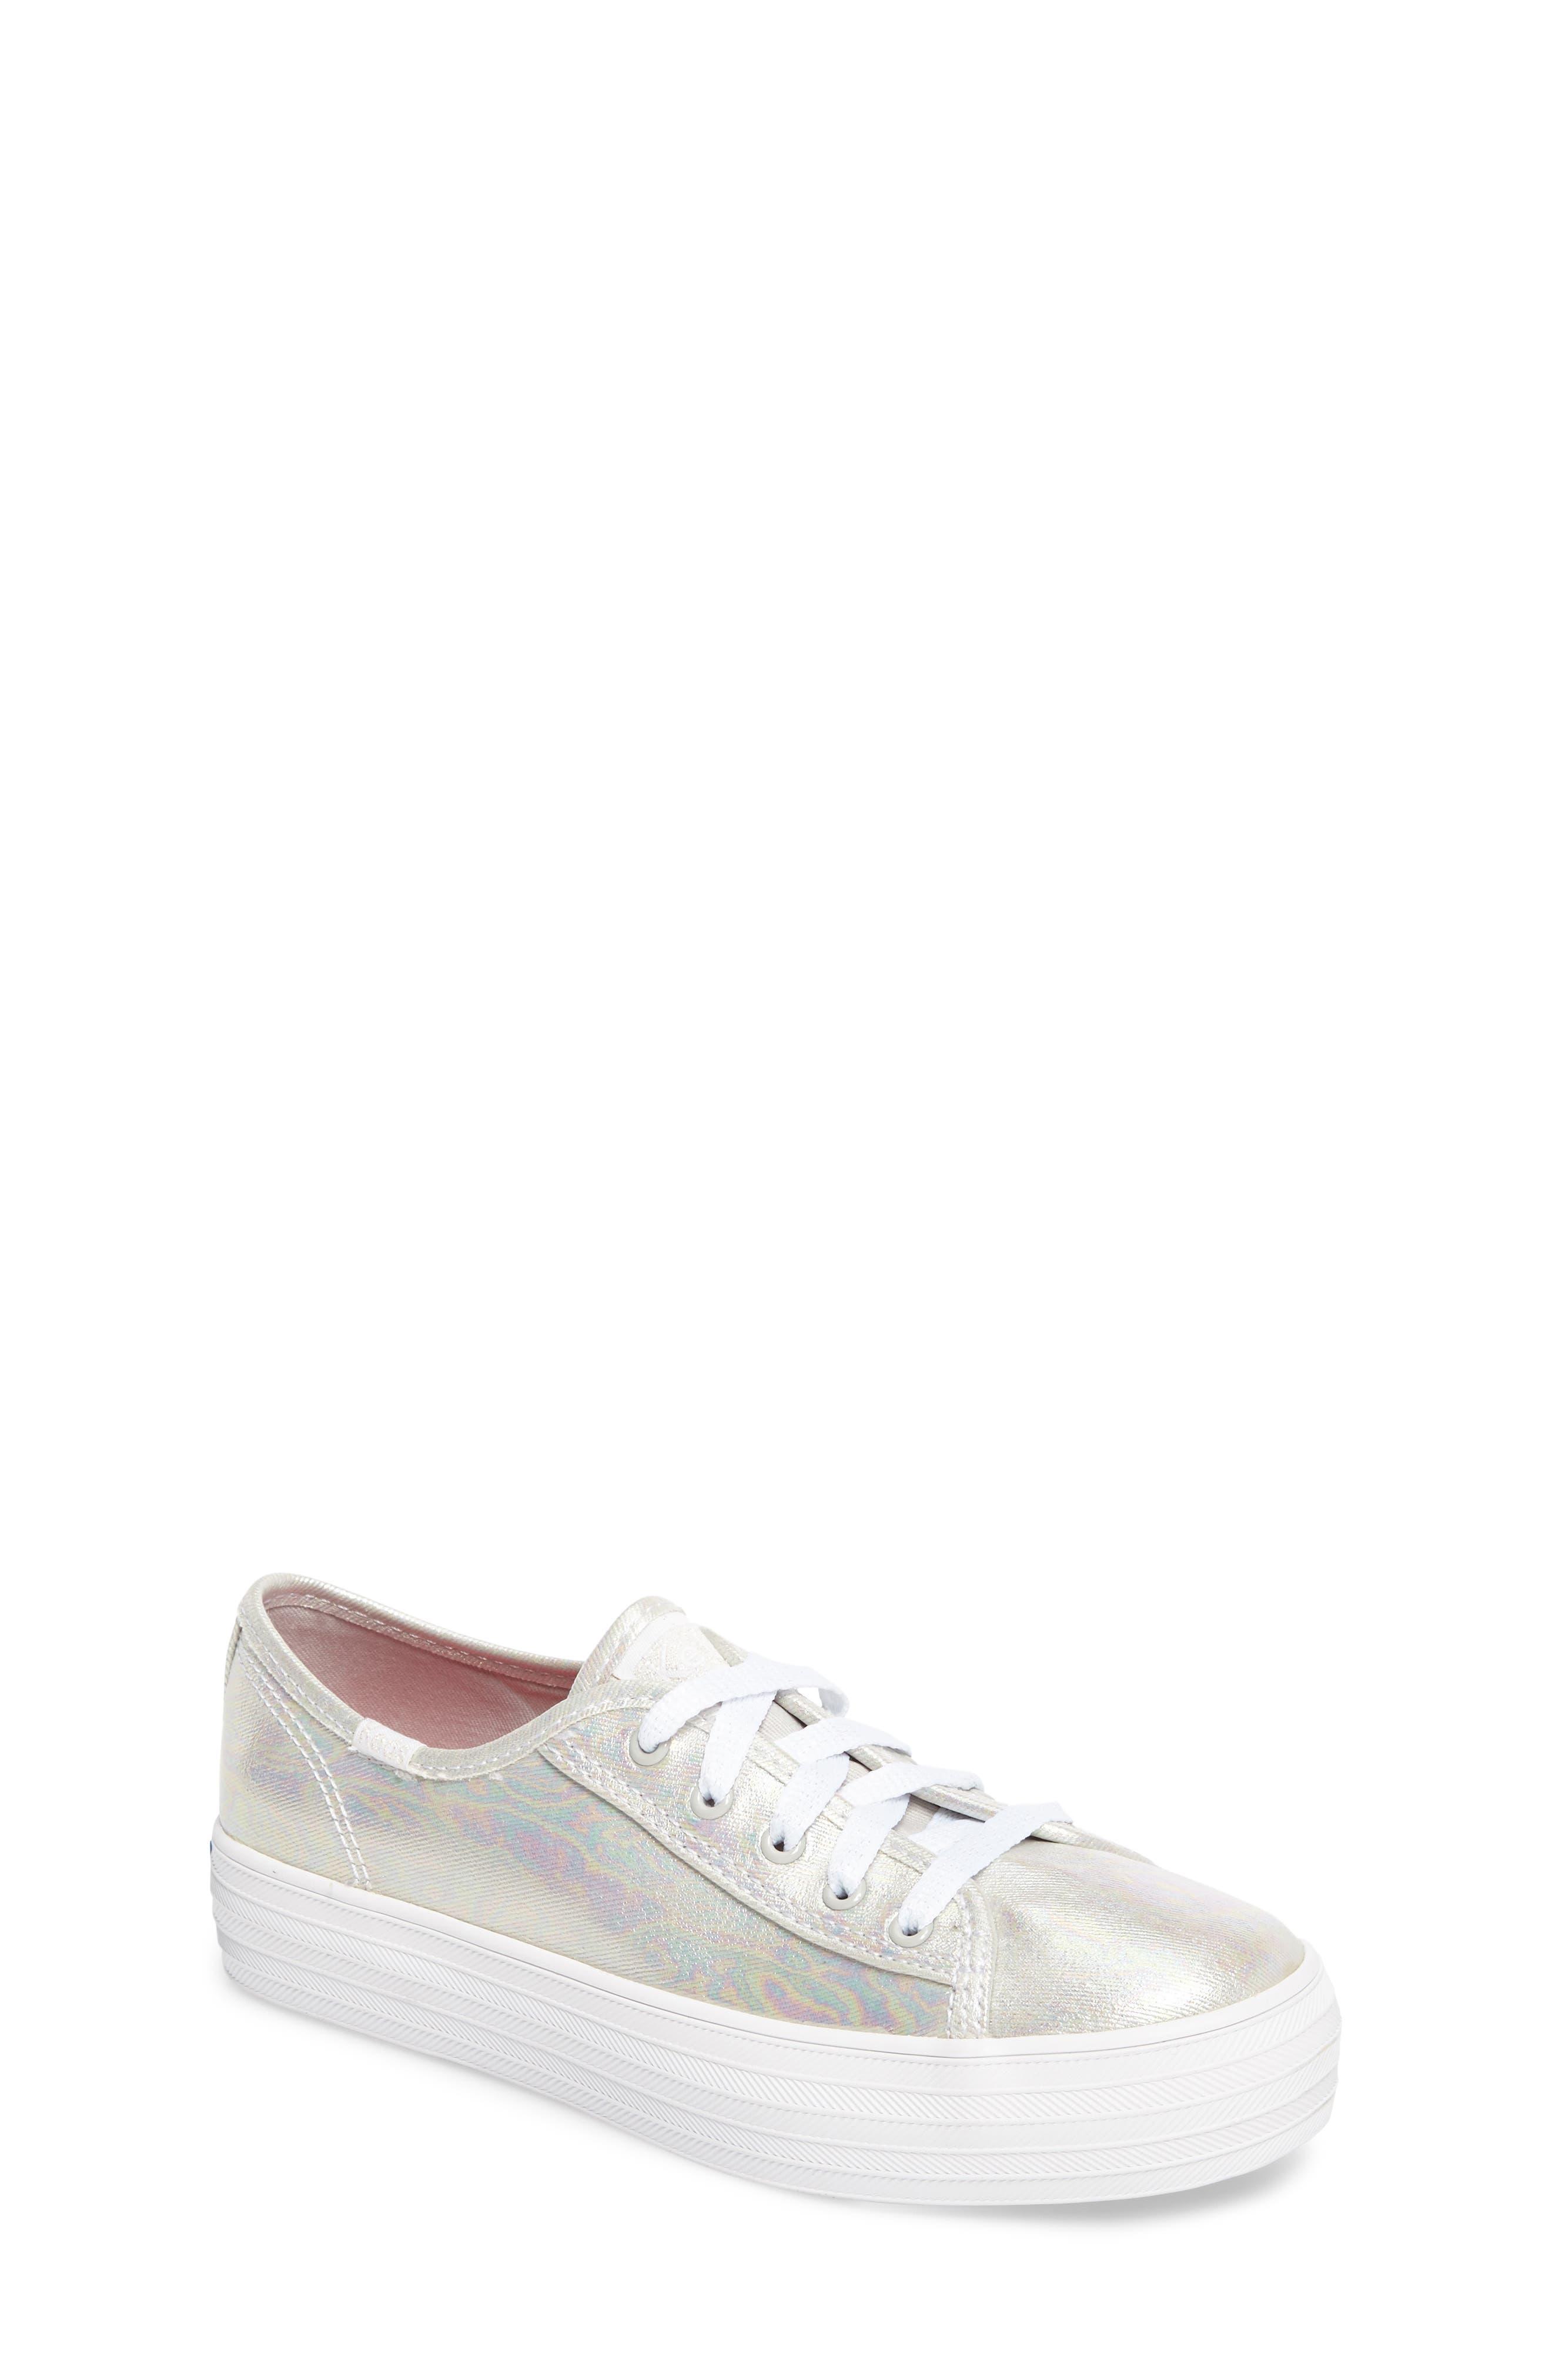 Triple Kick Platform Sneaker,                         Main,                         color, 020